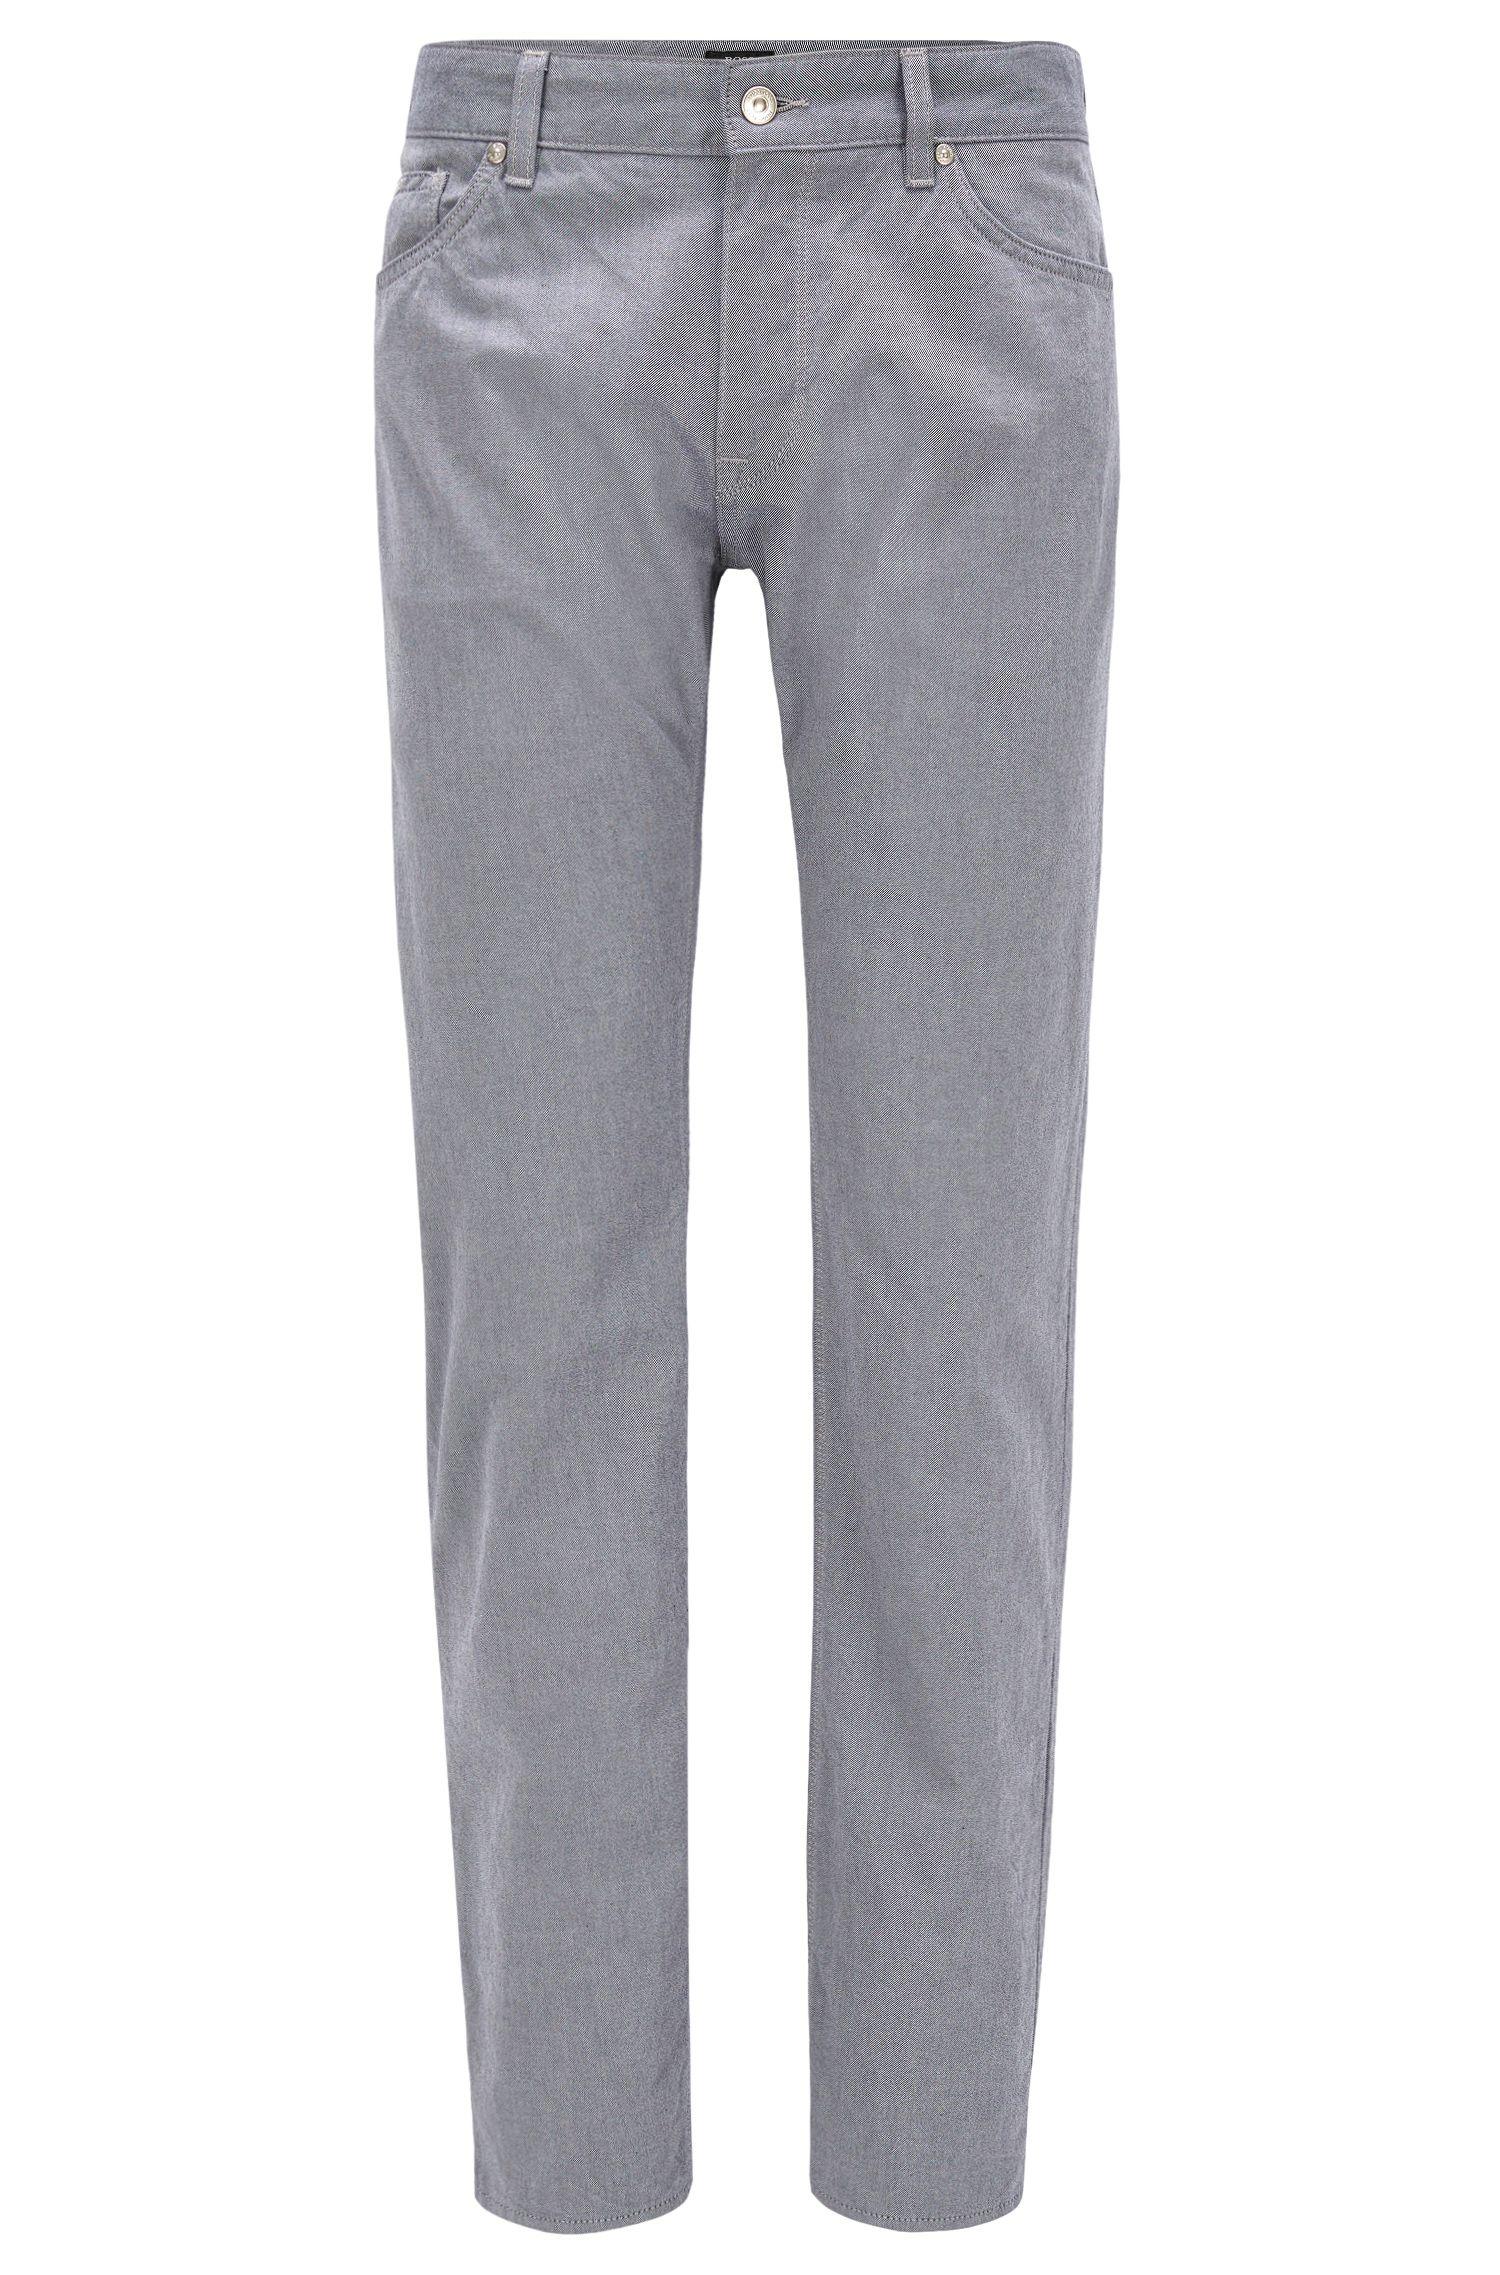 Jeans regular fit in twill di denim bicolore